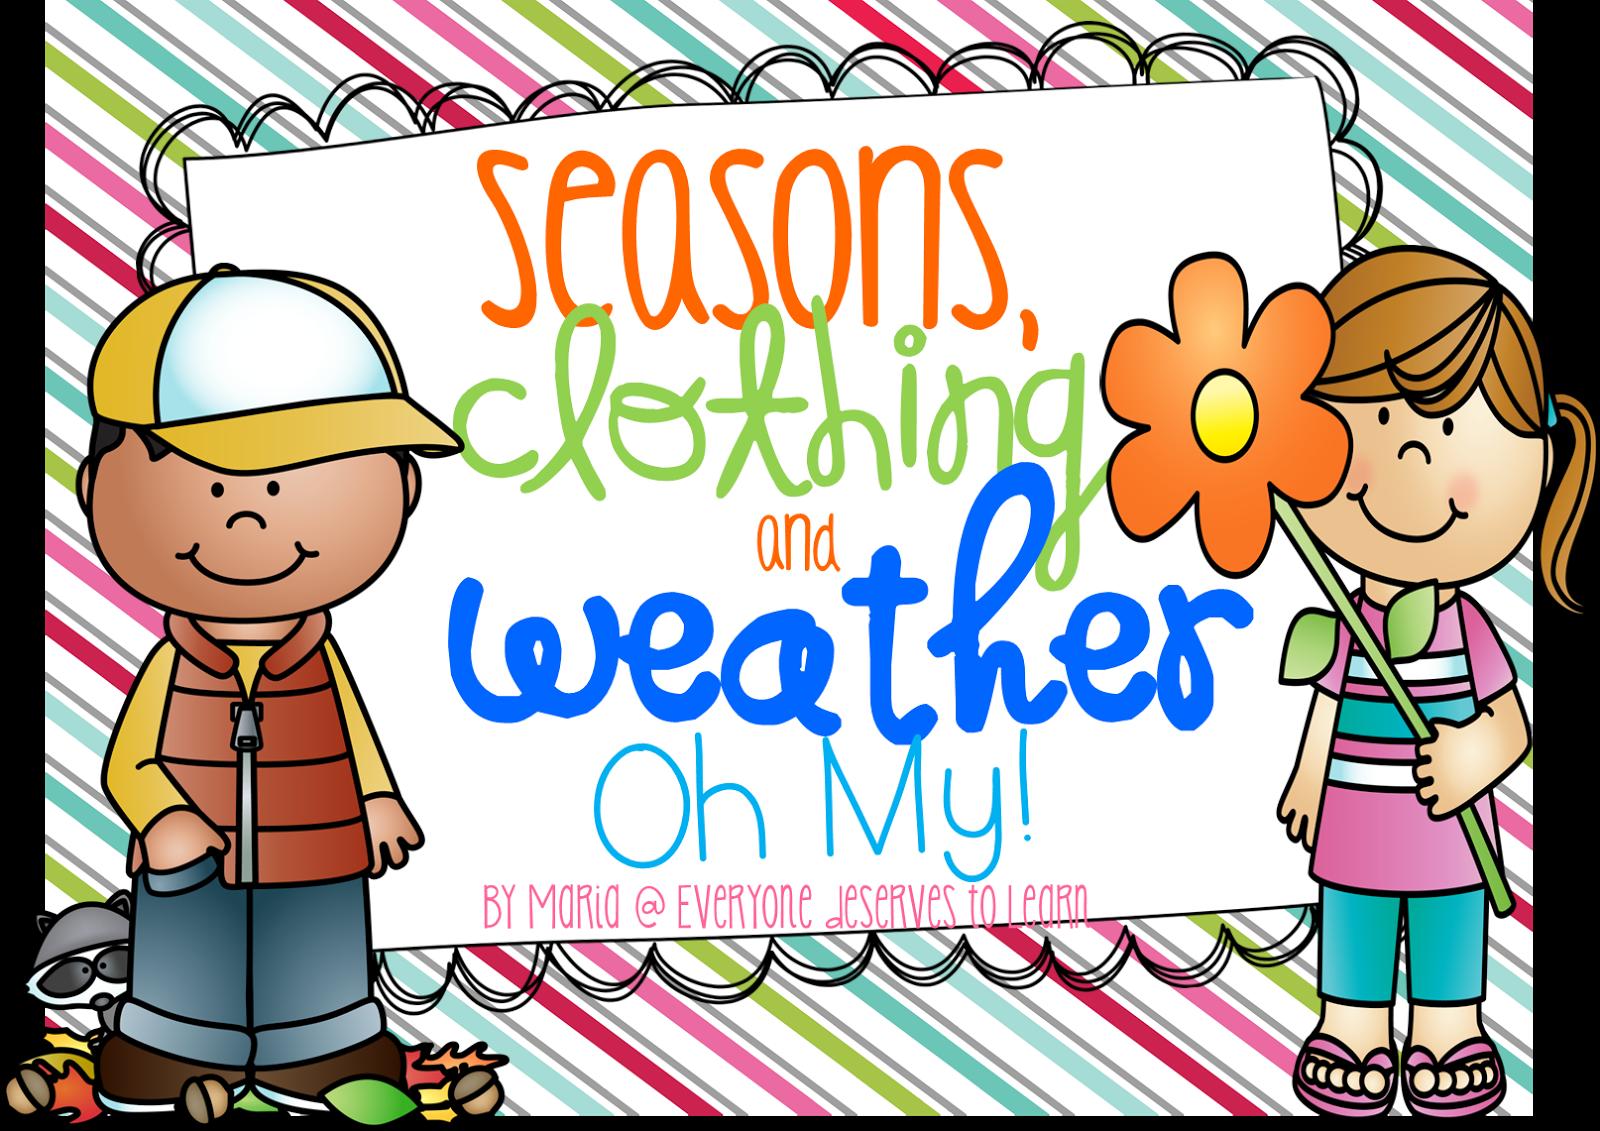 Teaching Seasons And Weather